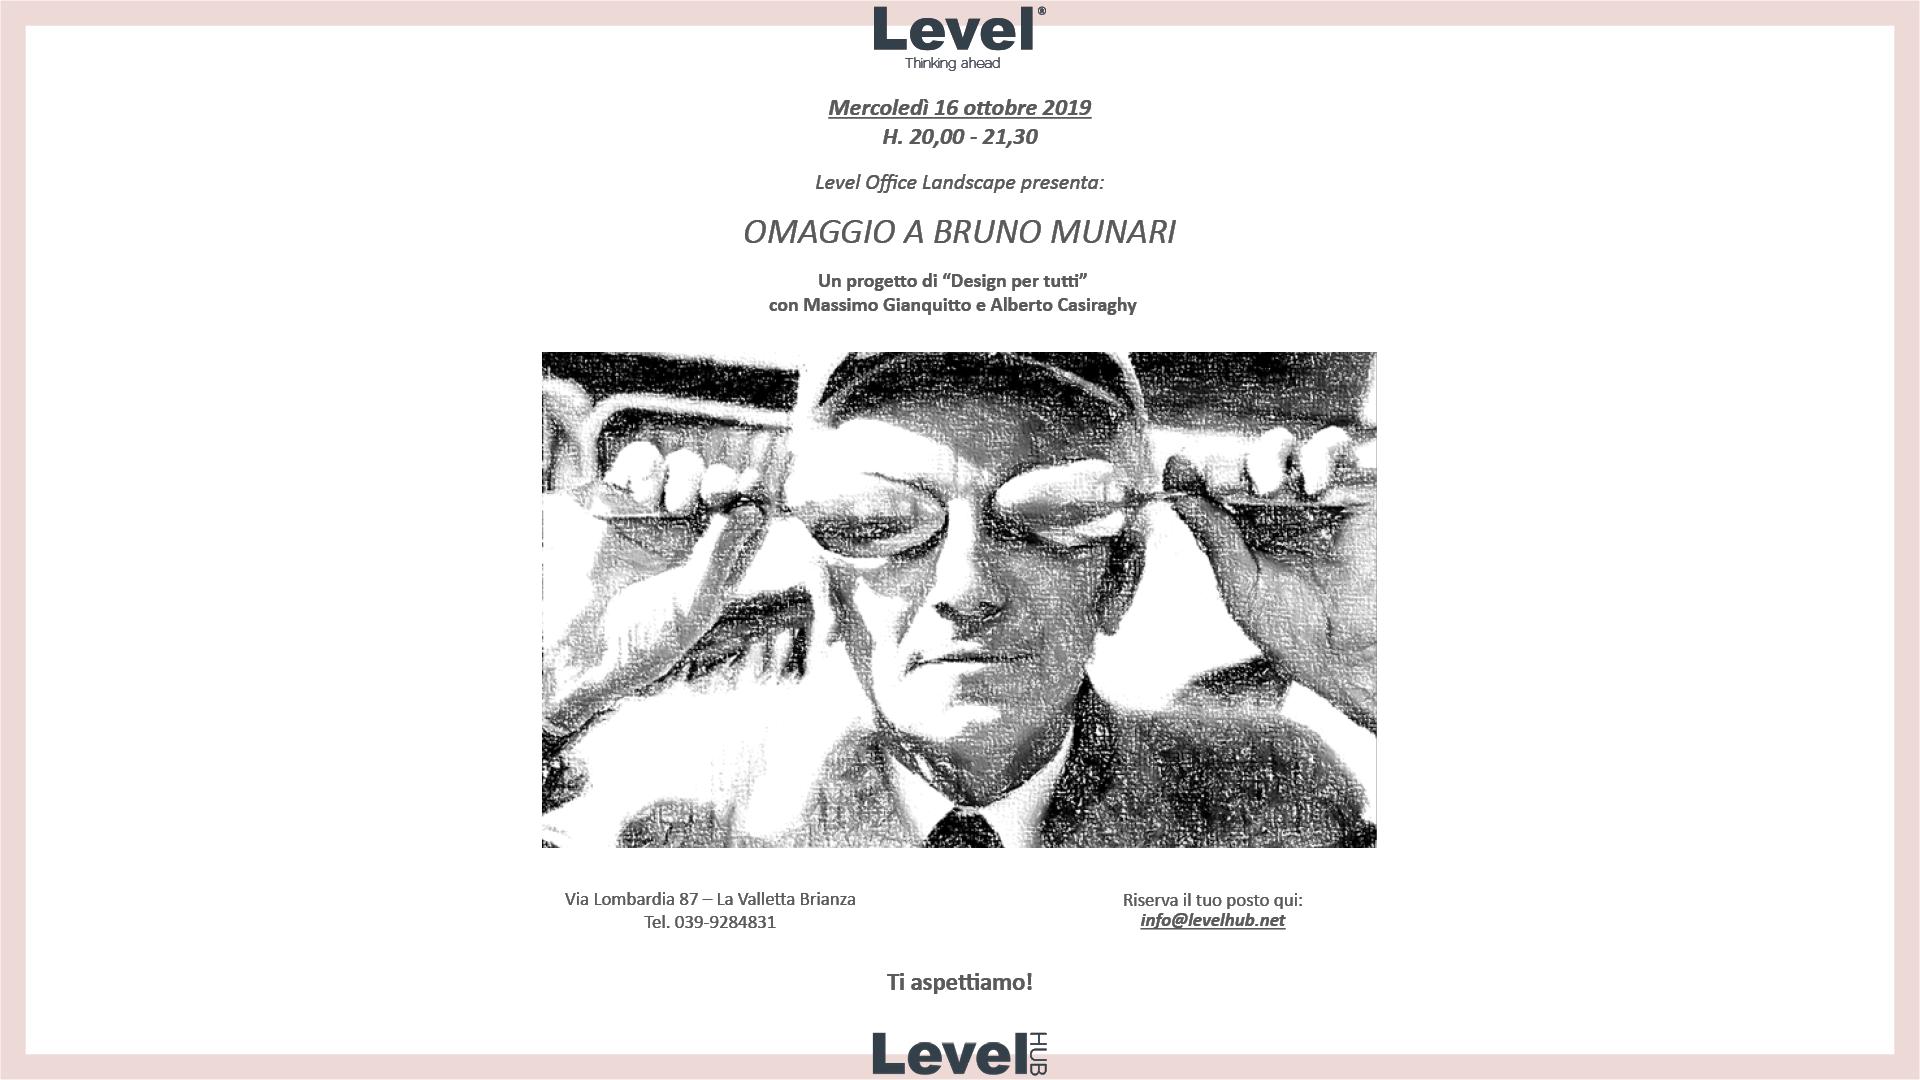 Design Per Tutti Com omaggio a bruno munari, a levelhub's event | level office